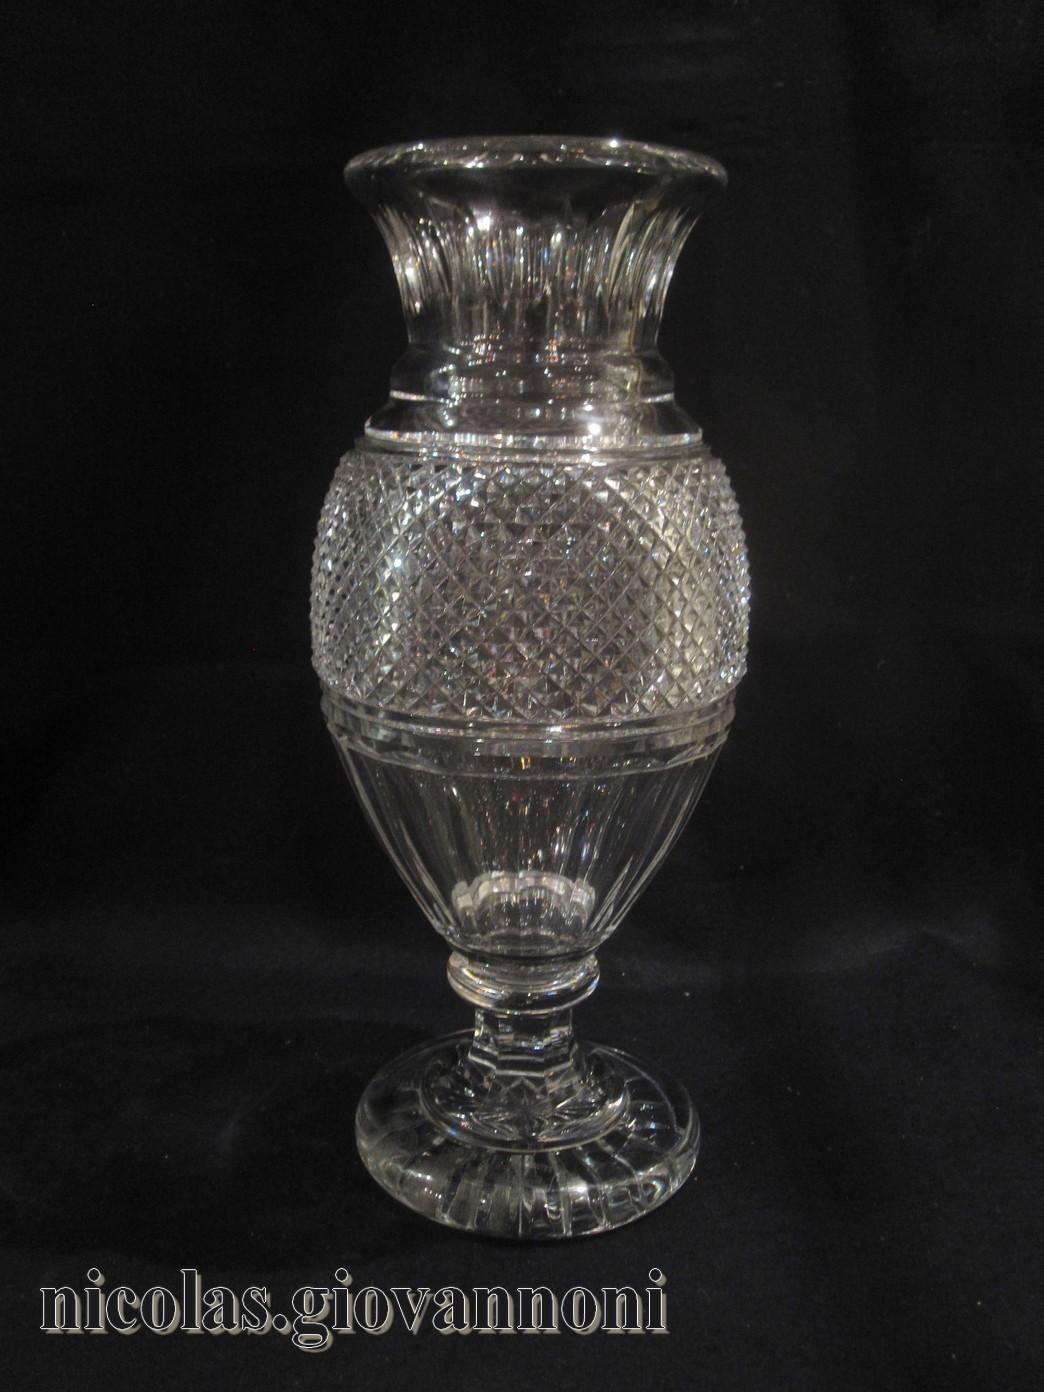 vase 35 cm edwige baccarat vases vases catalogue cristal de france nicolas giovannoni. Black Bedroom Furniture Sets. Home Design Ideas